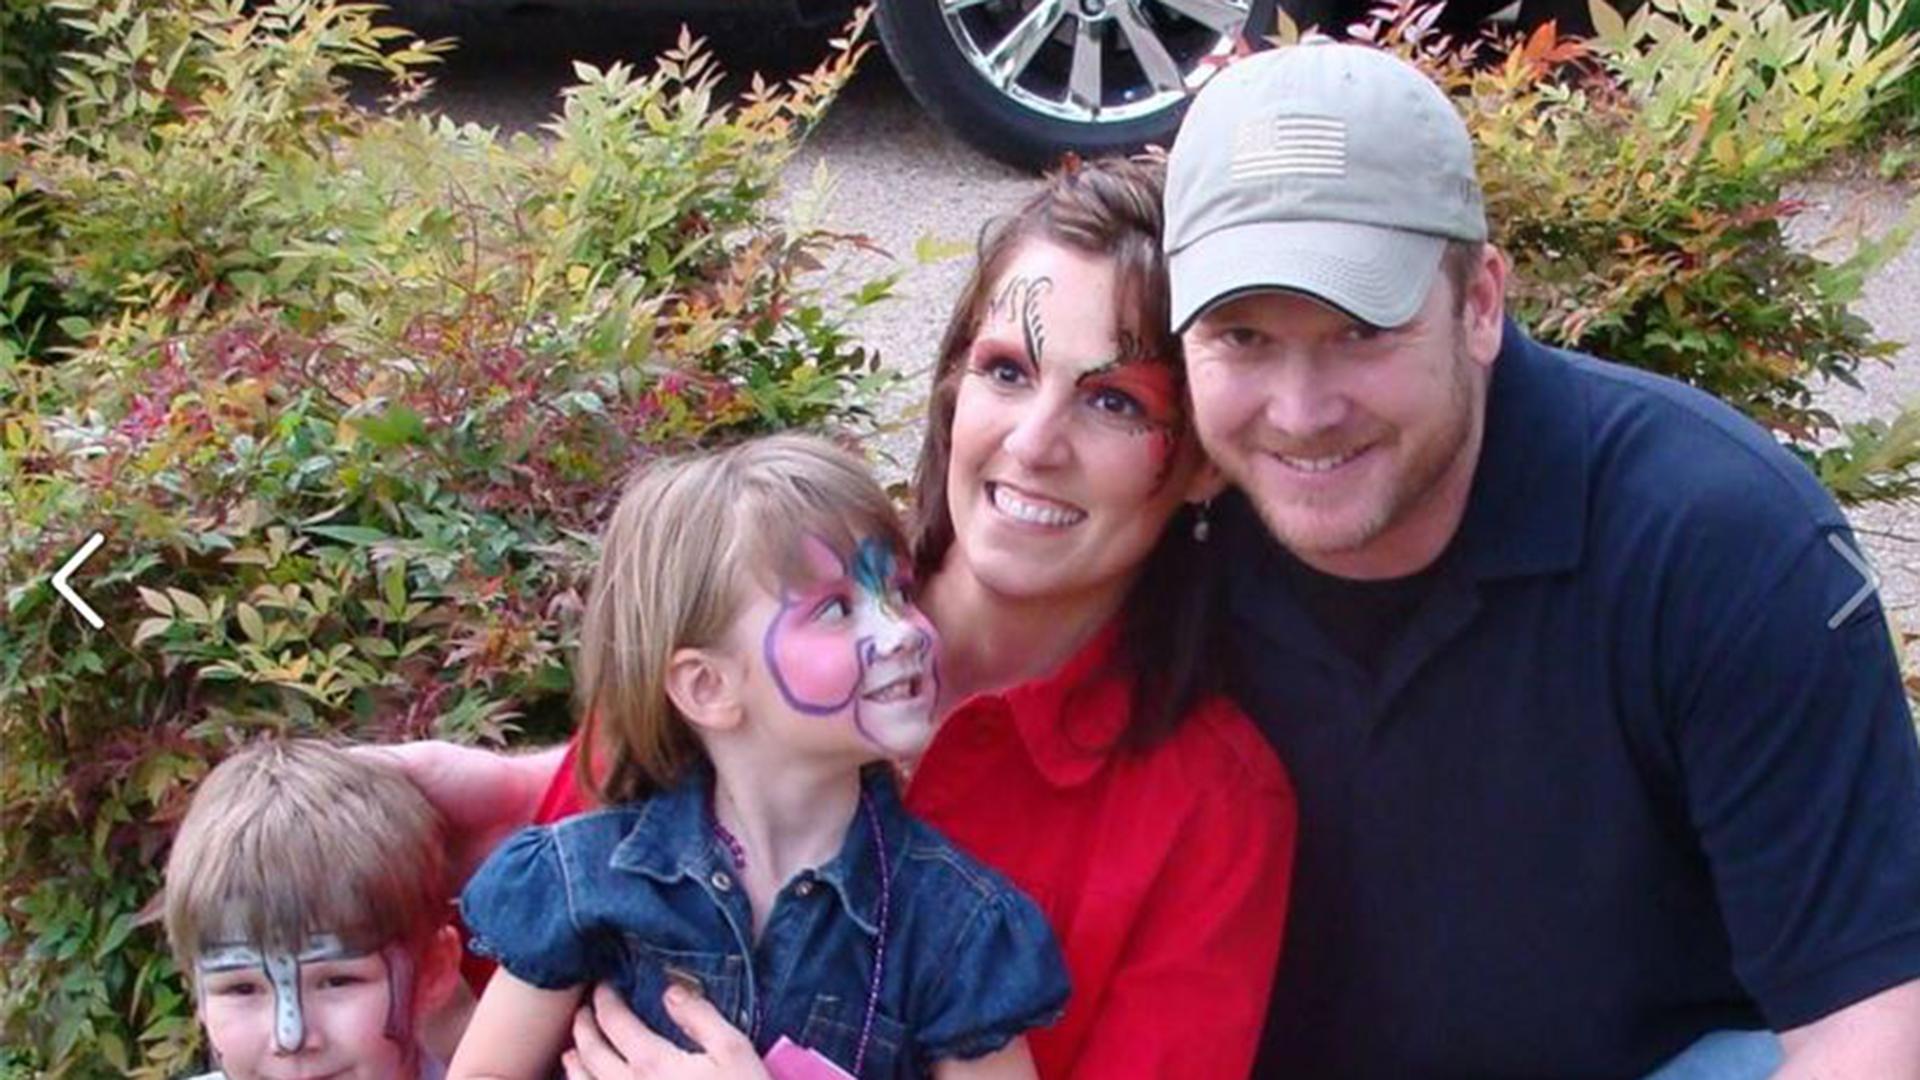 American Sniper' widow writes heartfelt birthday tribute to Chris